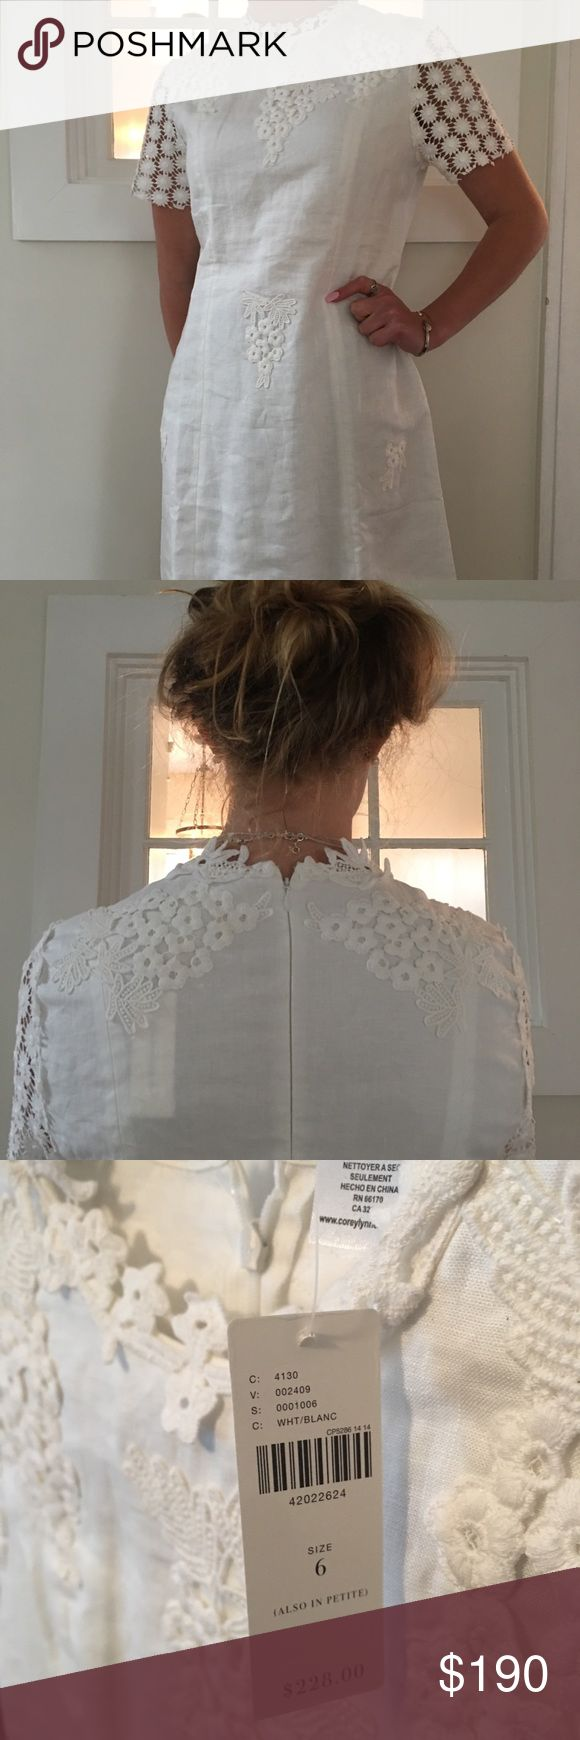 BRAND NEW WHITE ANTHROPOLOGY DRESS Originally priced at $228 Anthropologie Dresses Midi